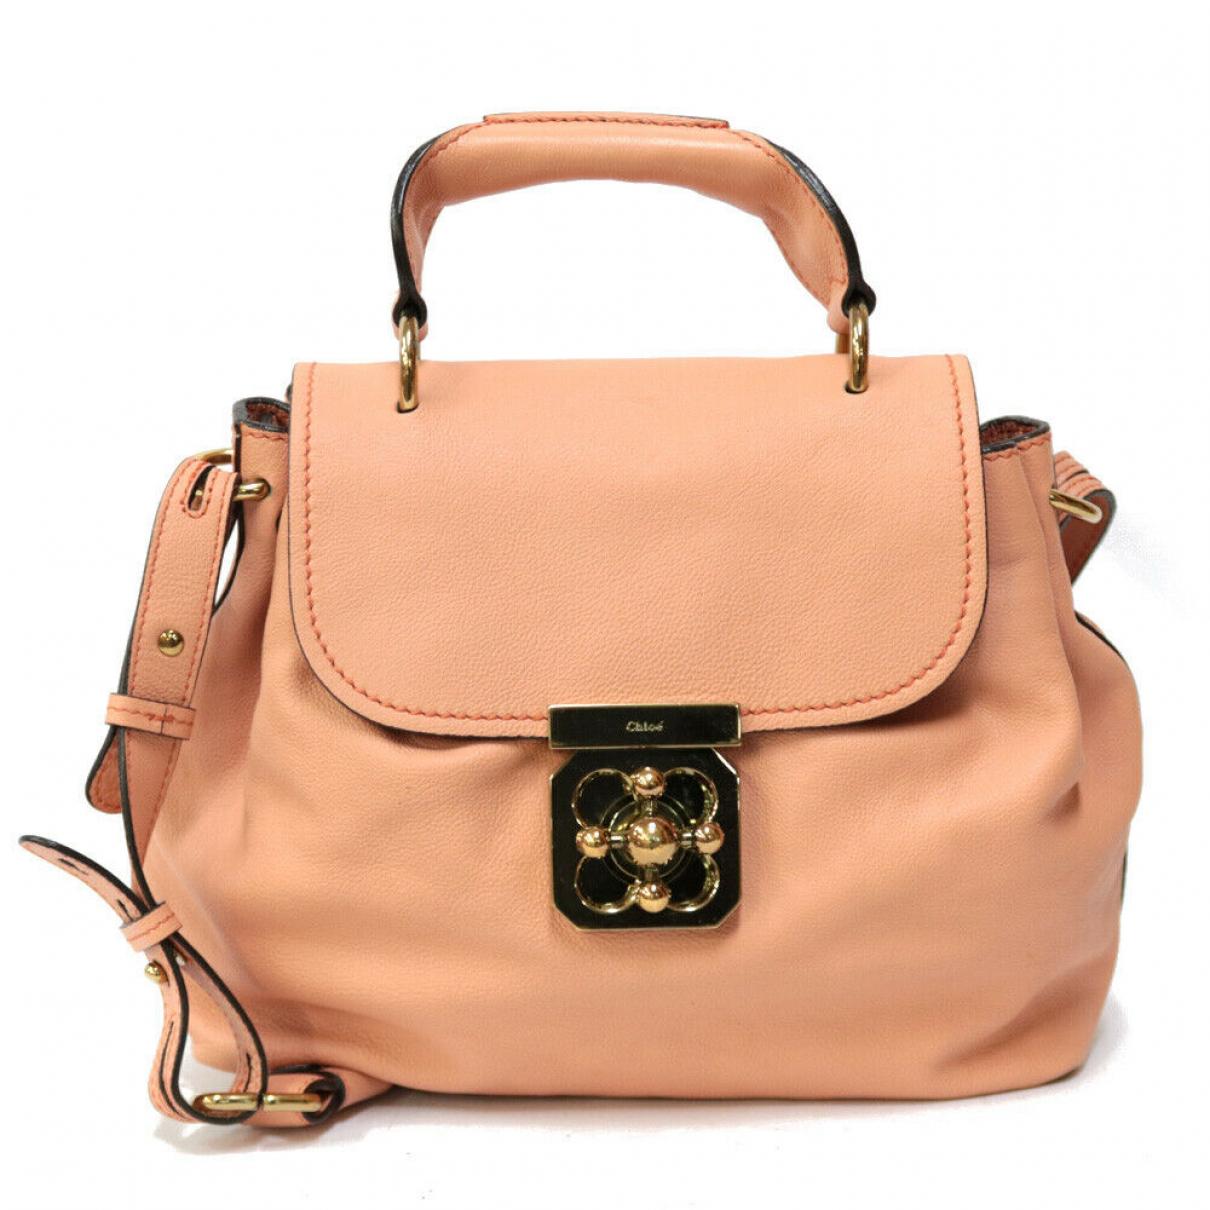 Chloé N Leather handbag for Women N